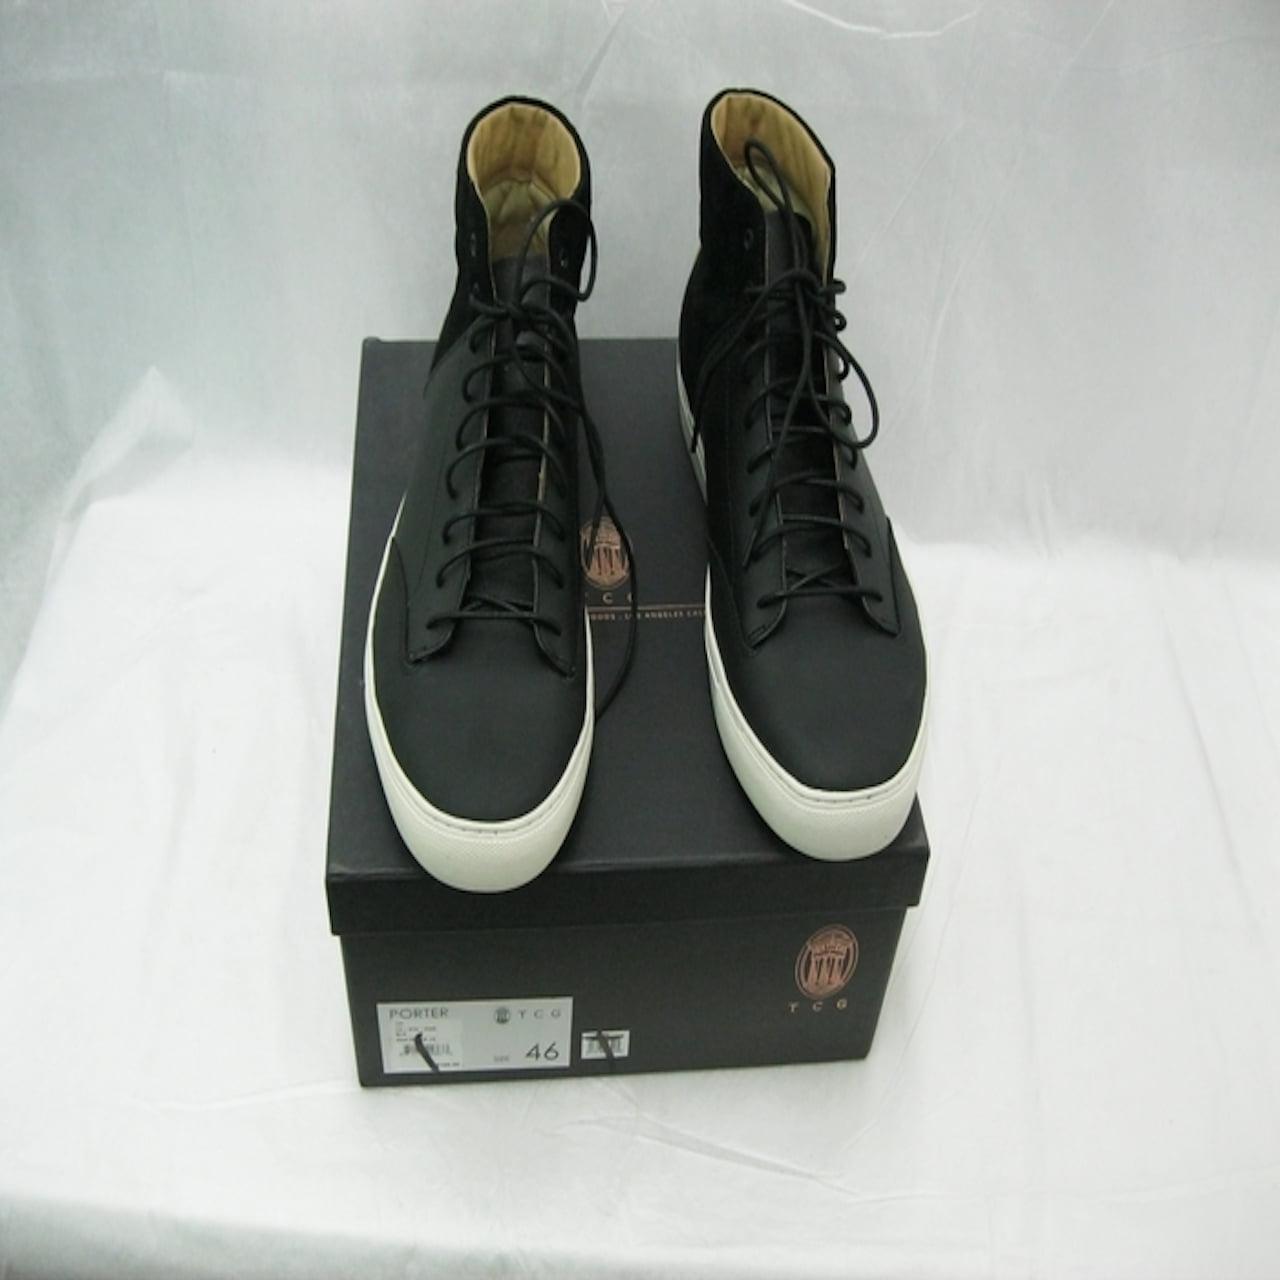 TCG Porter (Black) 13US High tops shoes - image 1 de 1